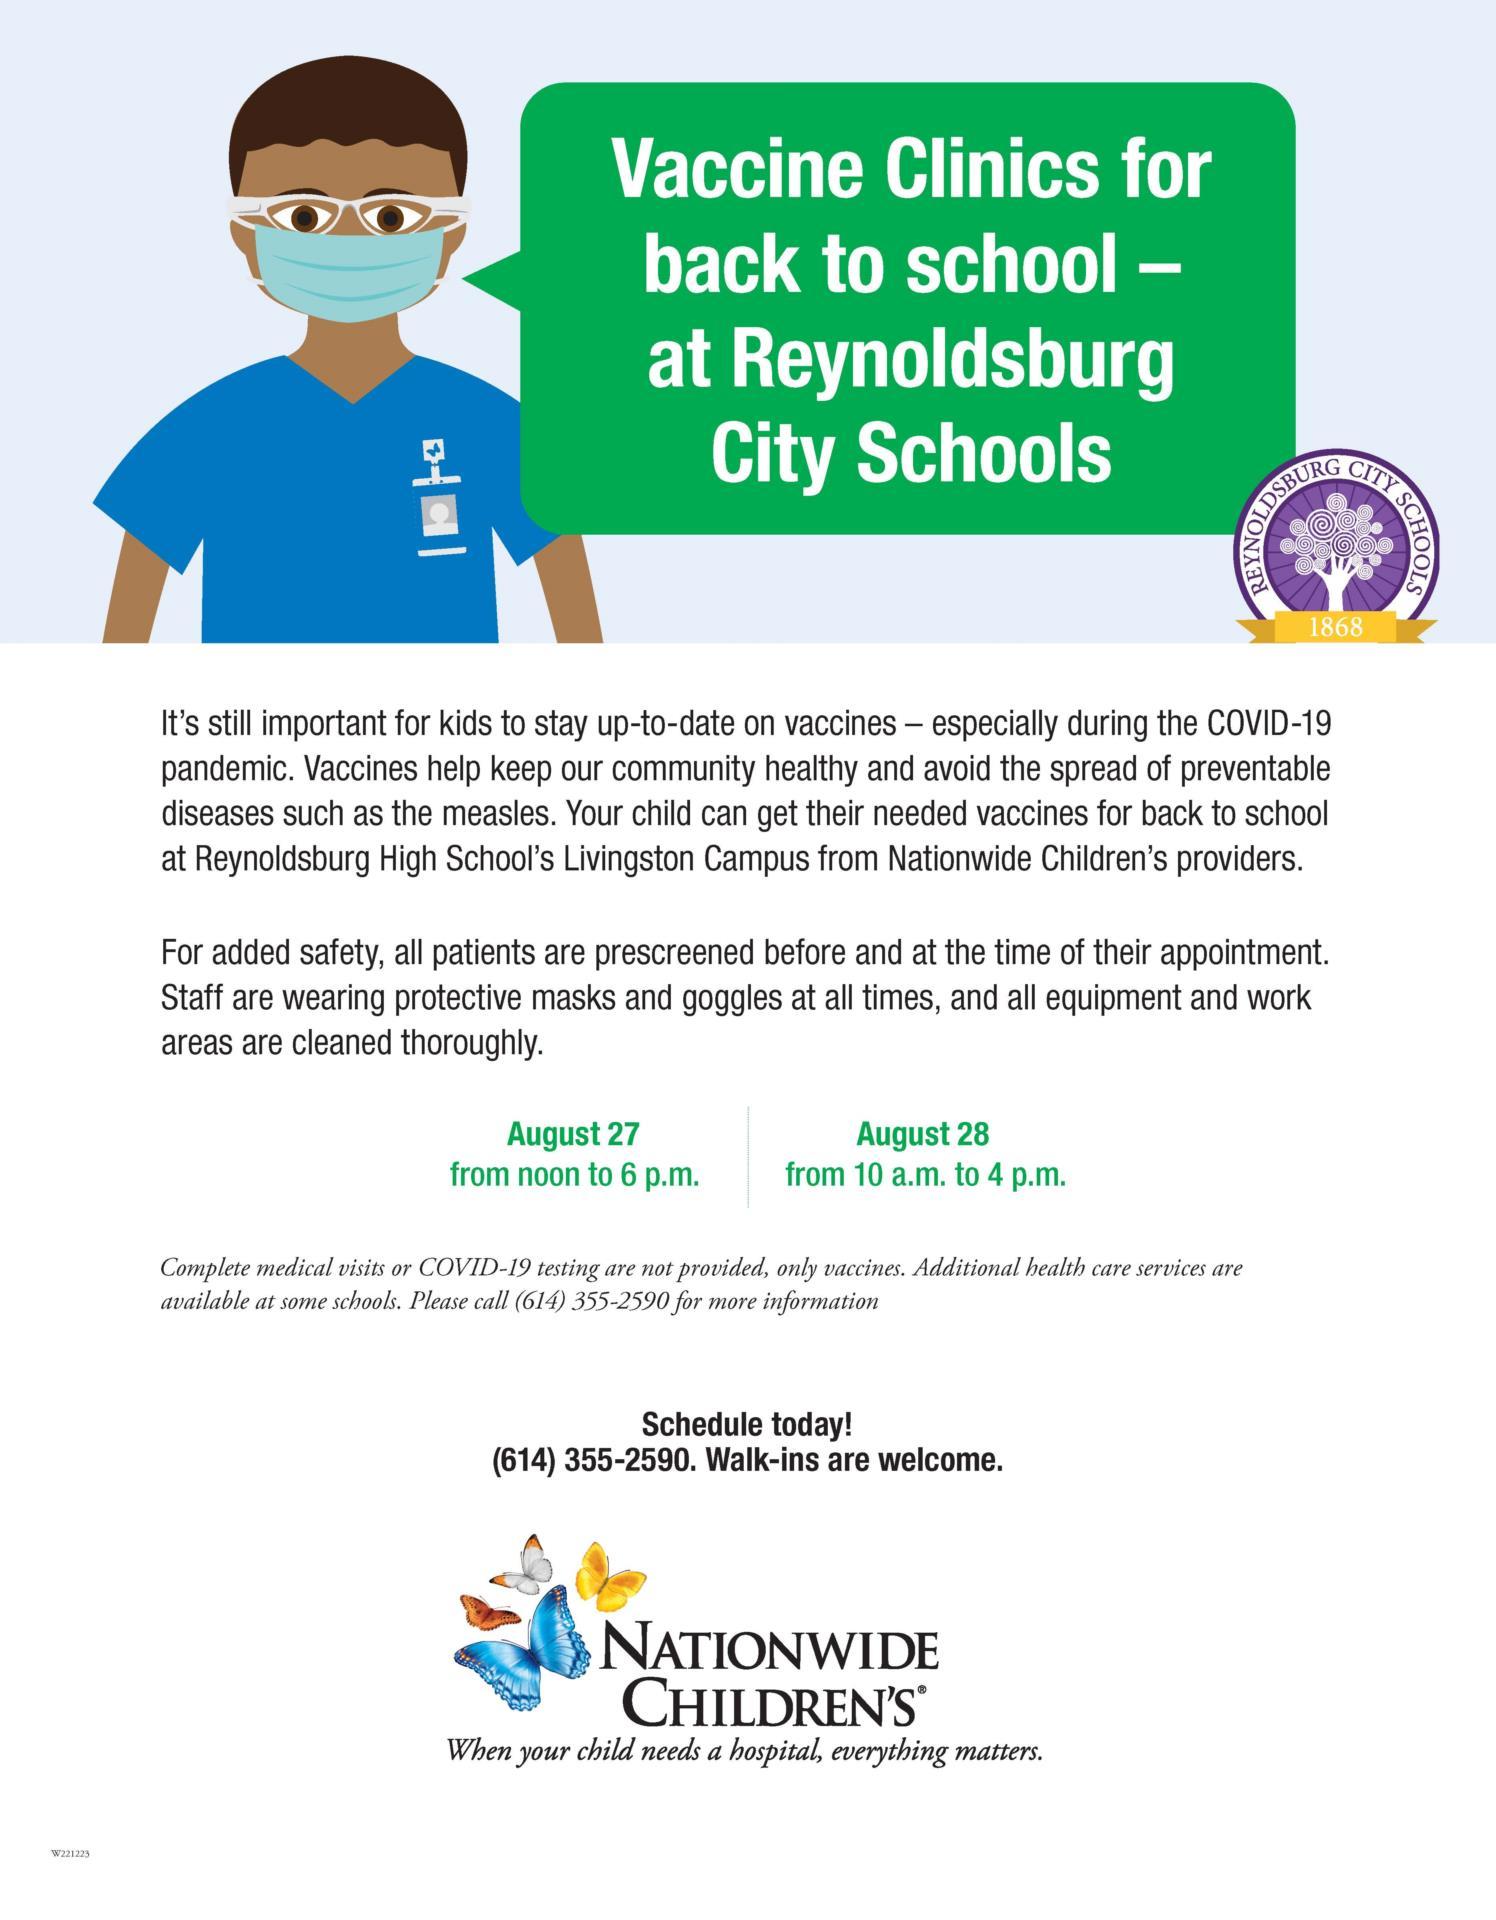 NCH Vaccine Clinics